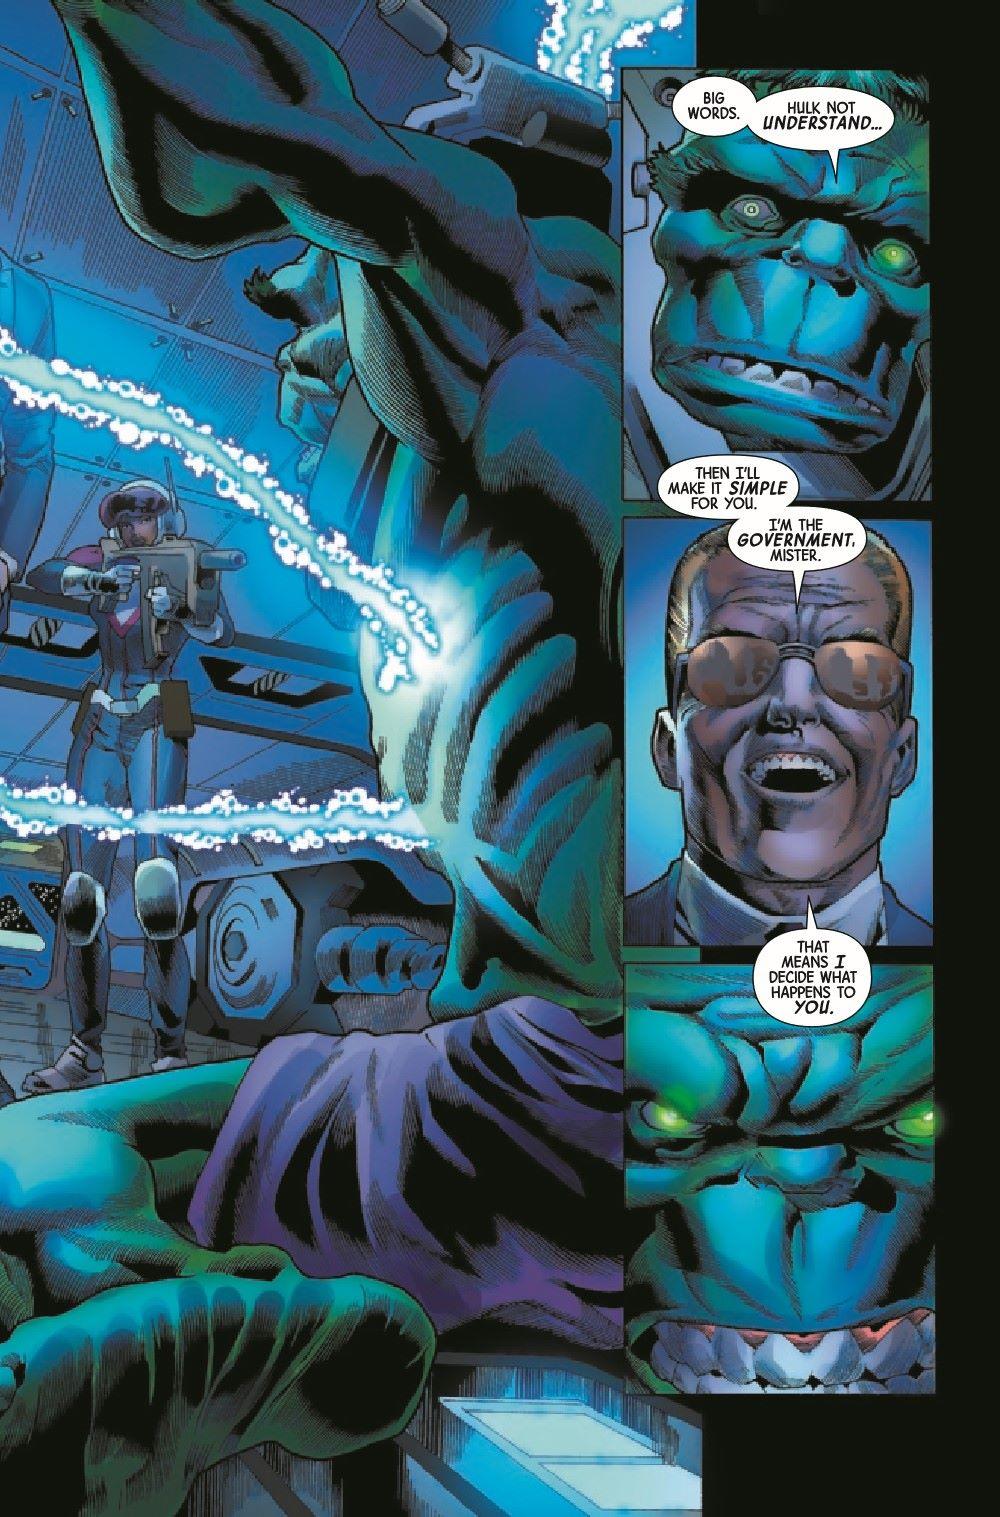 HULK2018040_Preview-3 ComicList Previews: IMMORTAL HULK #40